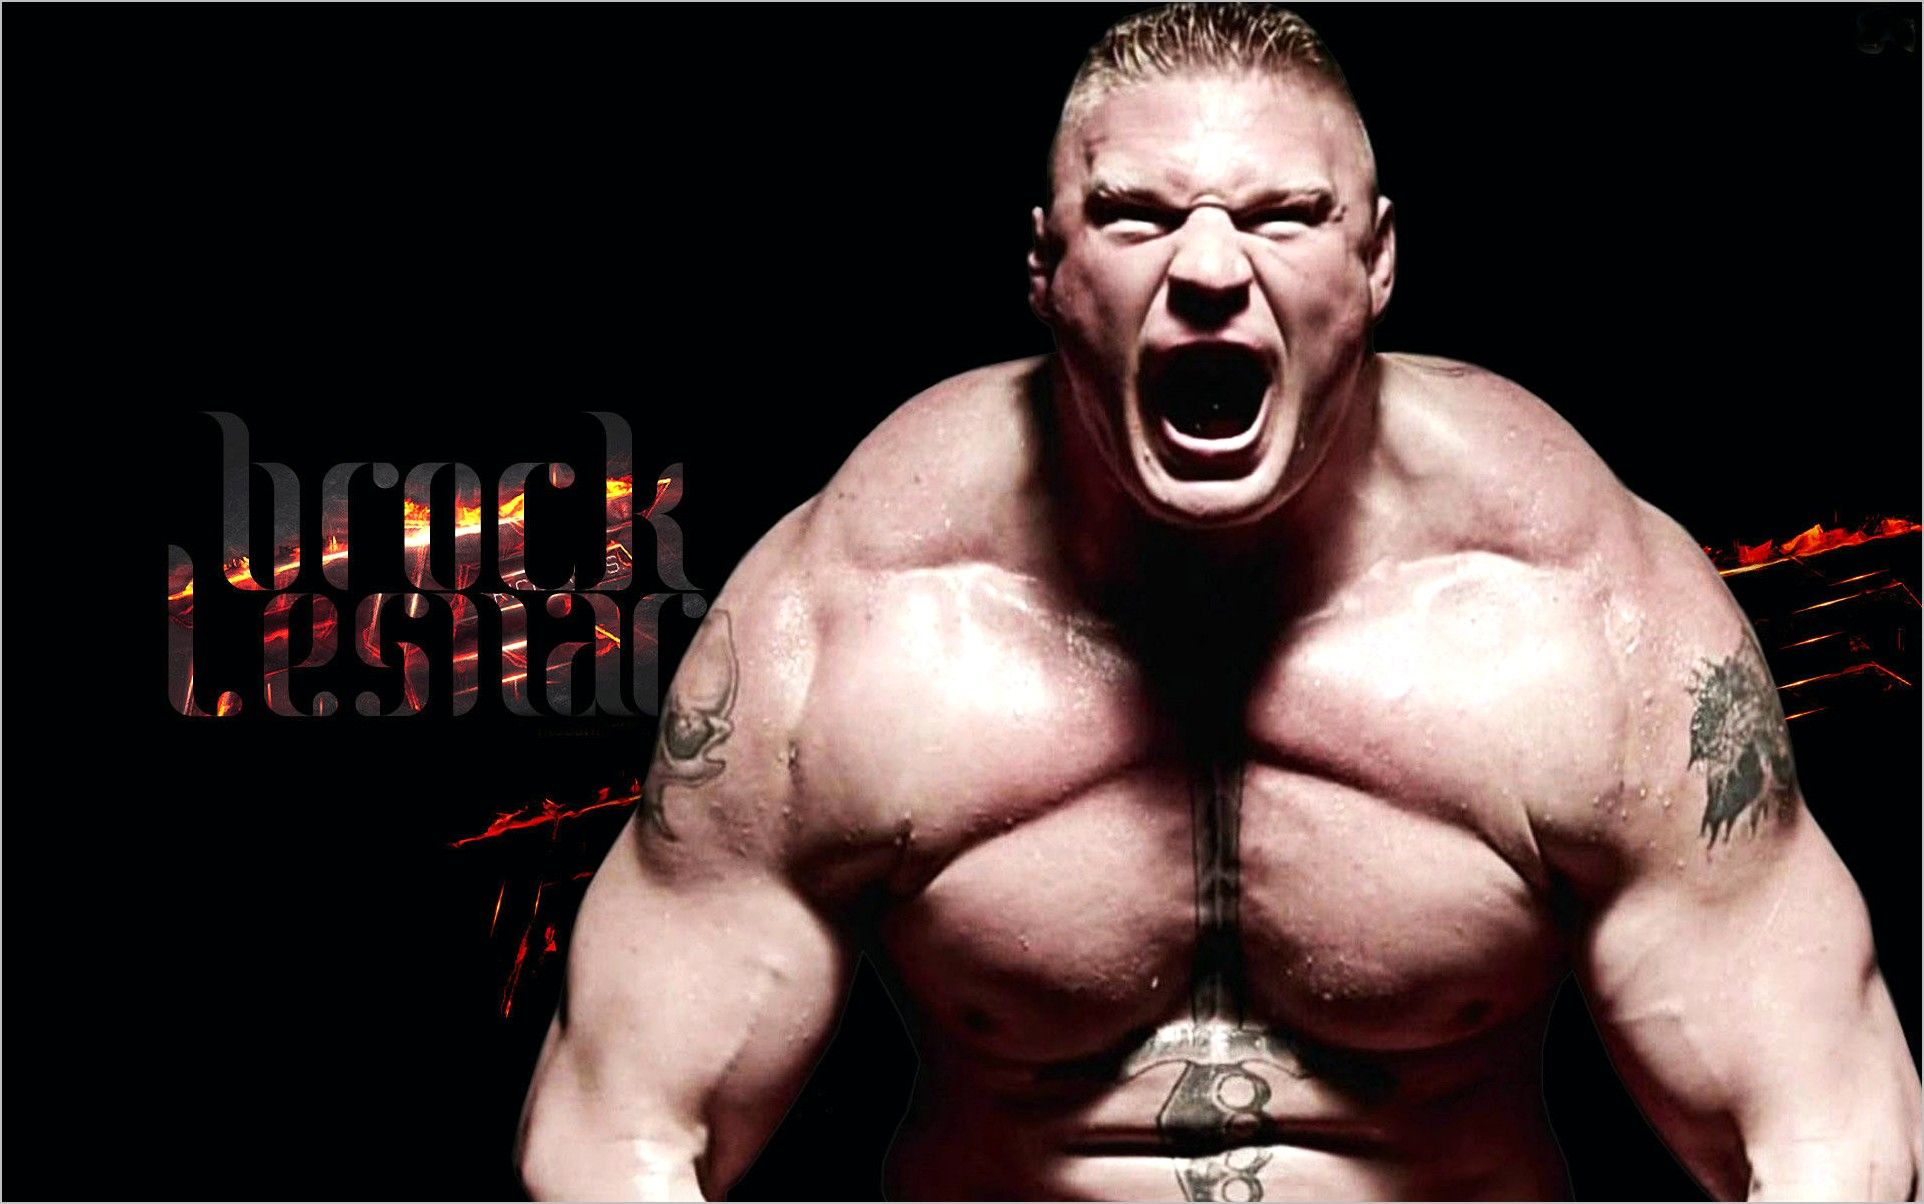 Brock Lesnar Wallpaper 4k Wwe Brock Brock Lesnar Brock Lesna